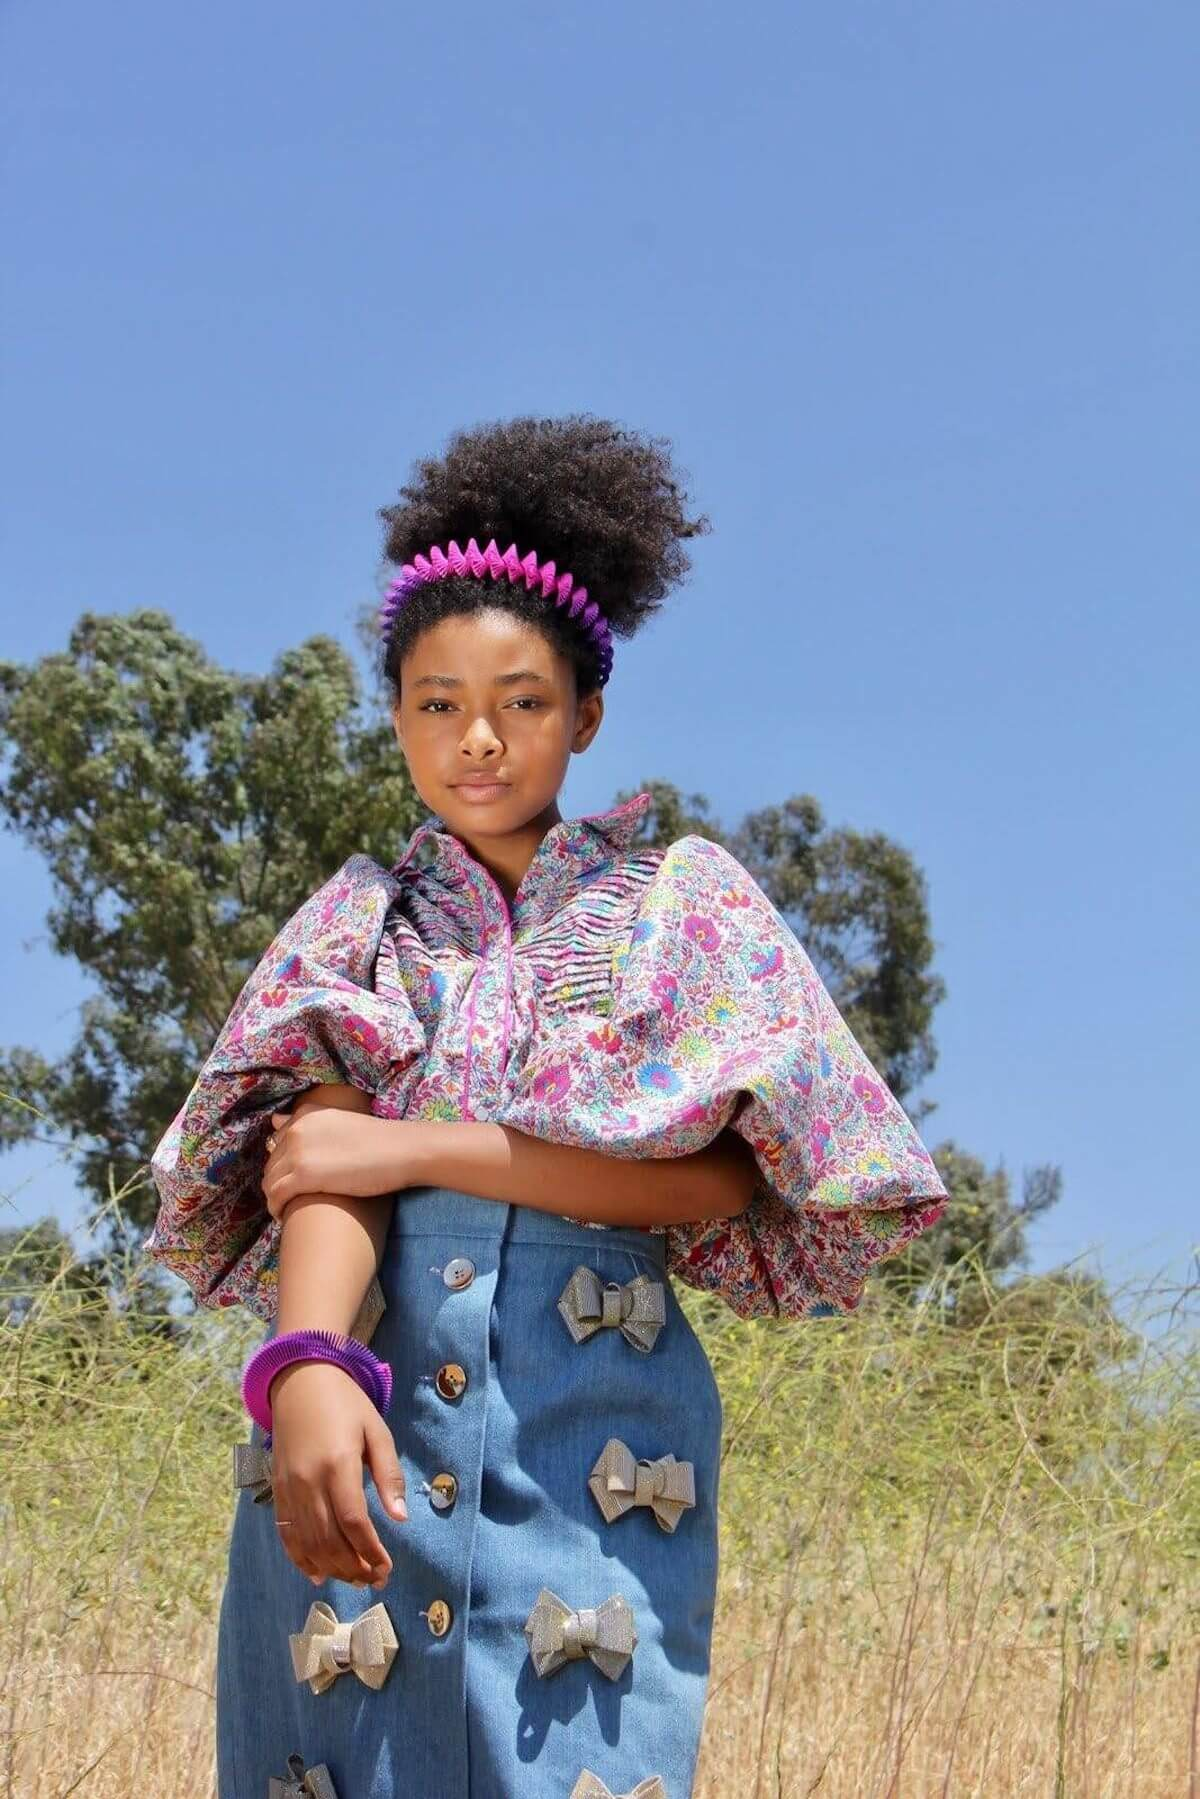 Mychal-Bella bowman bow skirt